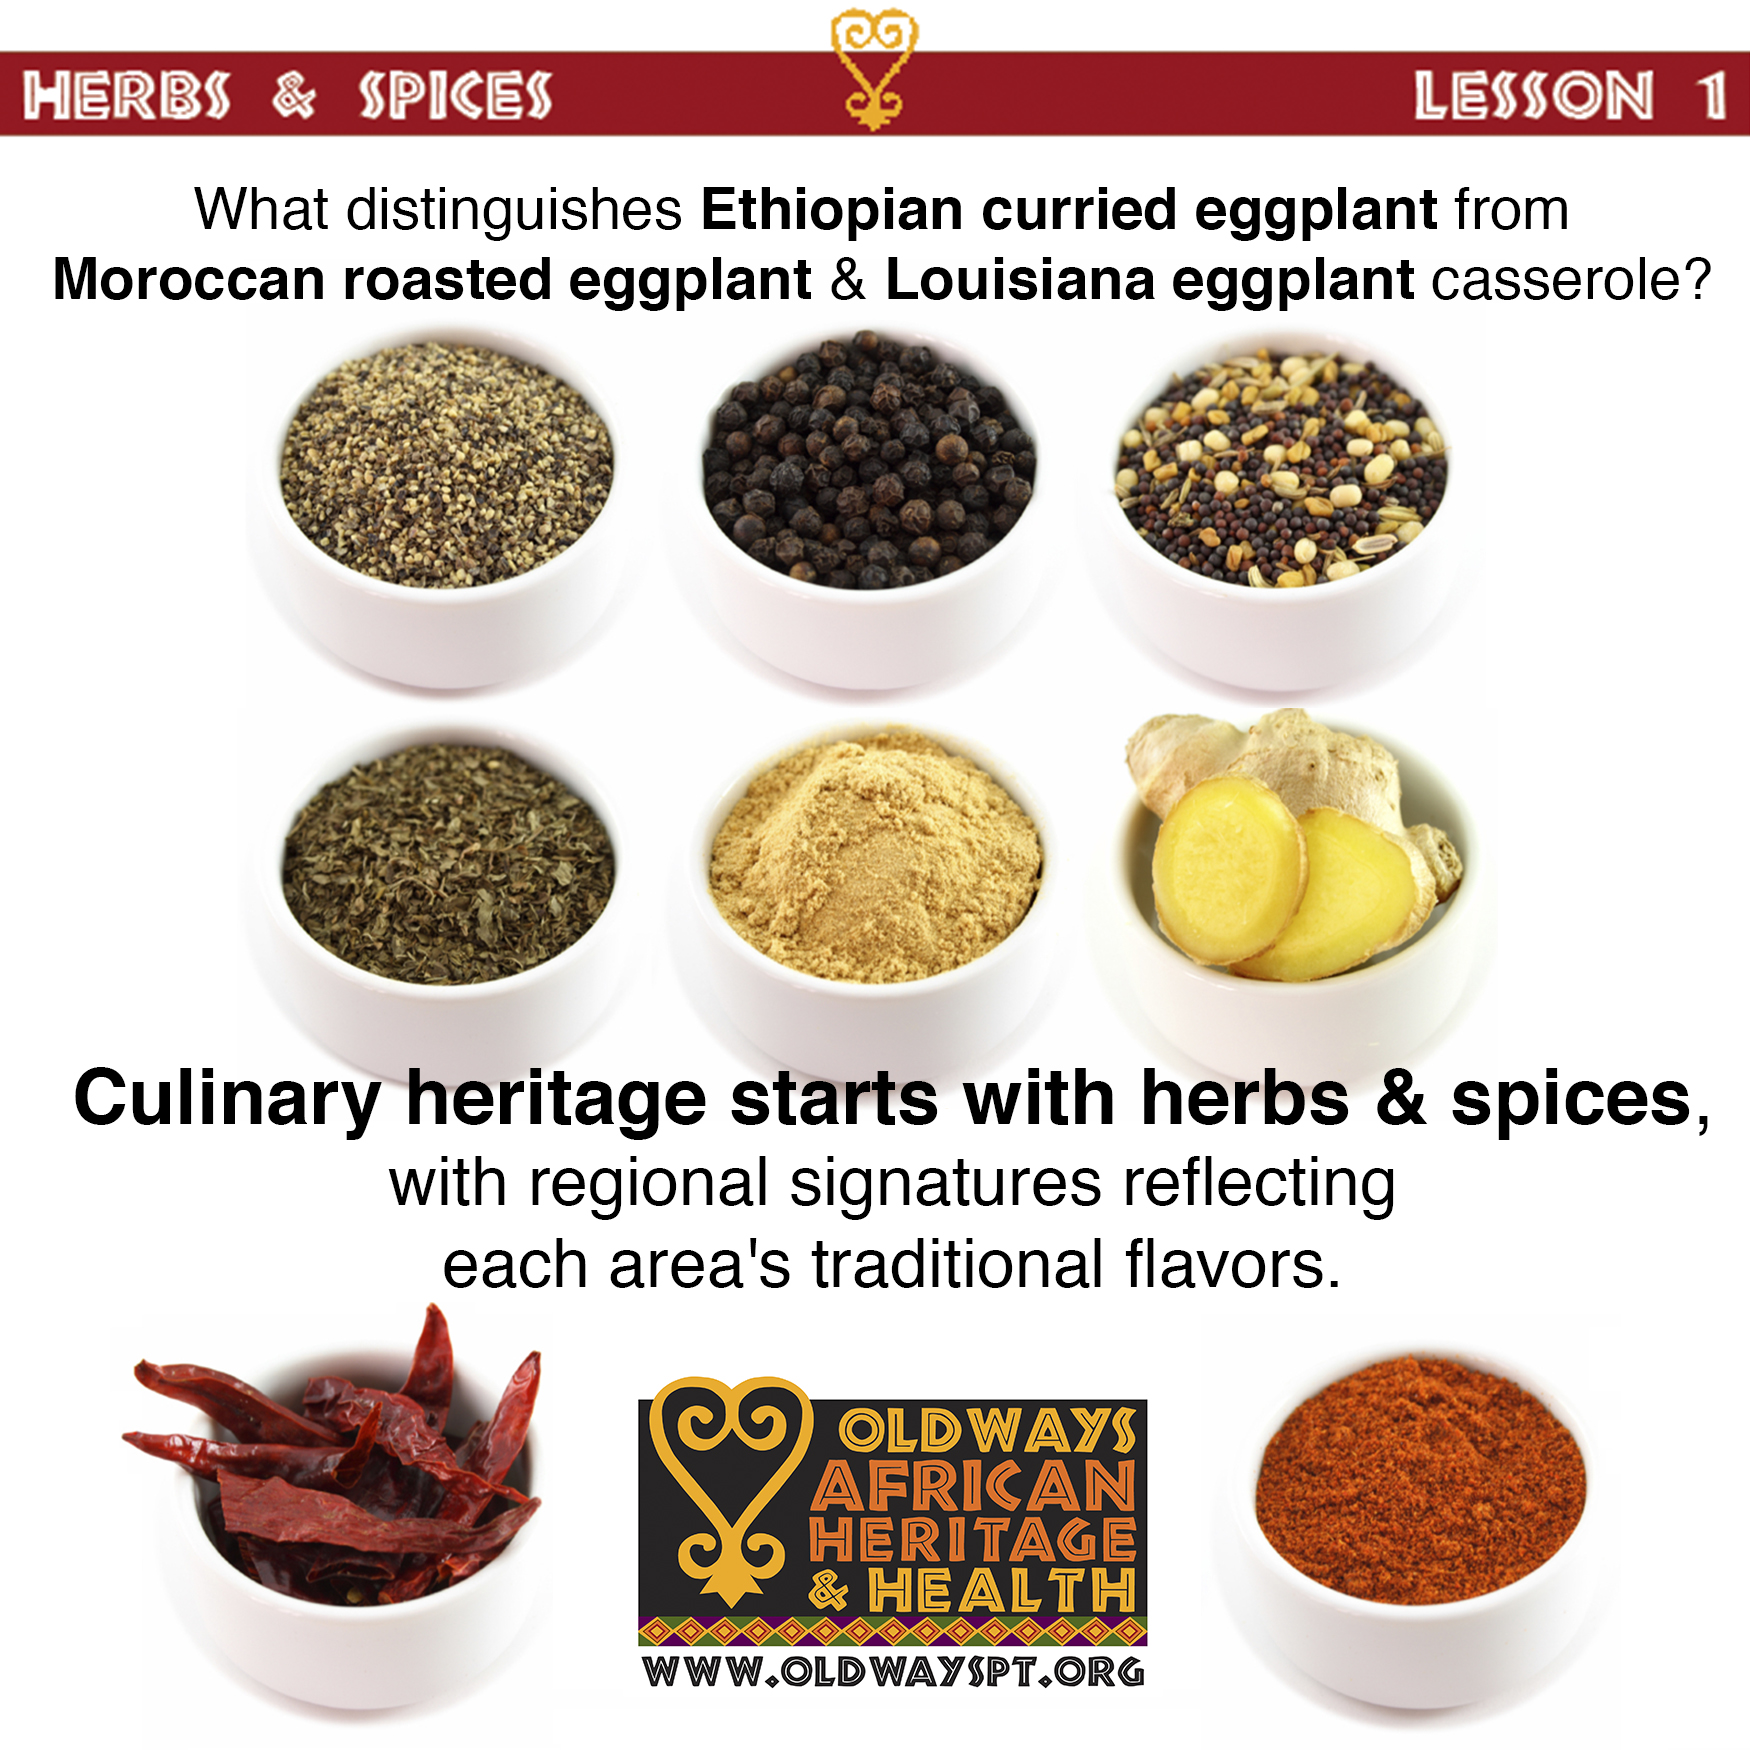 ATOAH_Lesson1_Spices.jpg